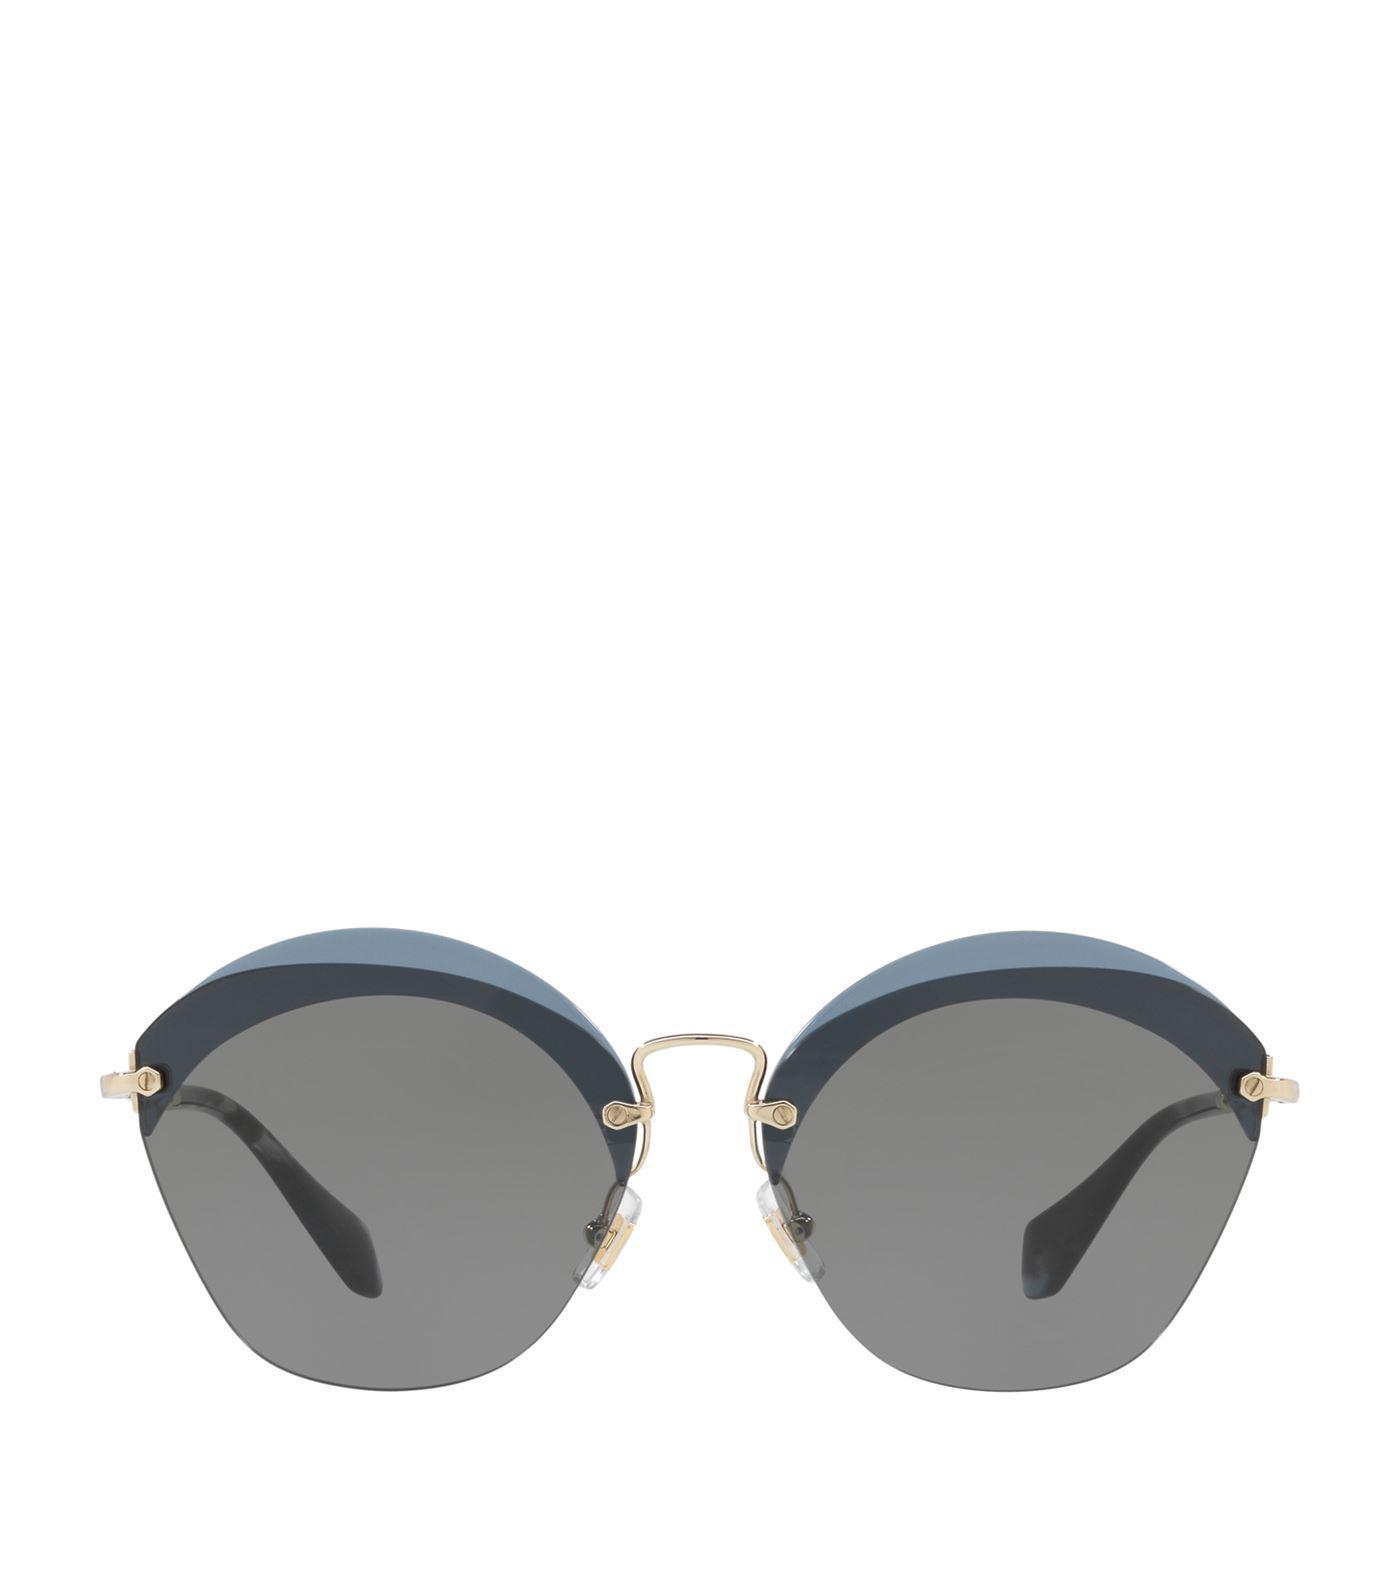 7ca4aa600cd Lyst - Miu Miu Irregular Sunglasses in Gray - Save 22%